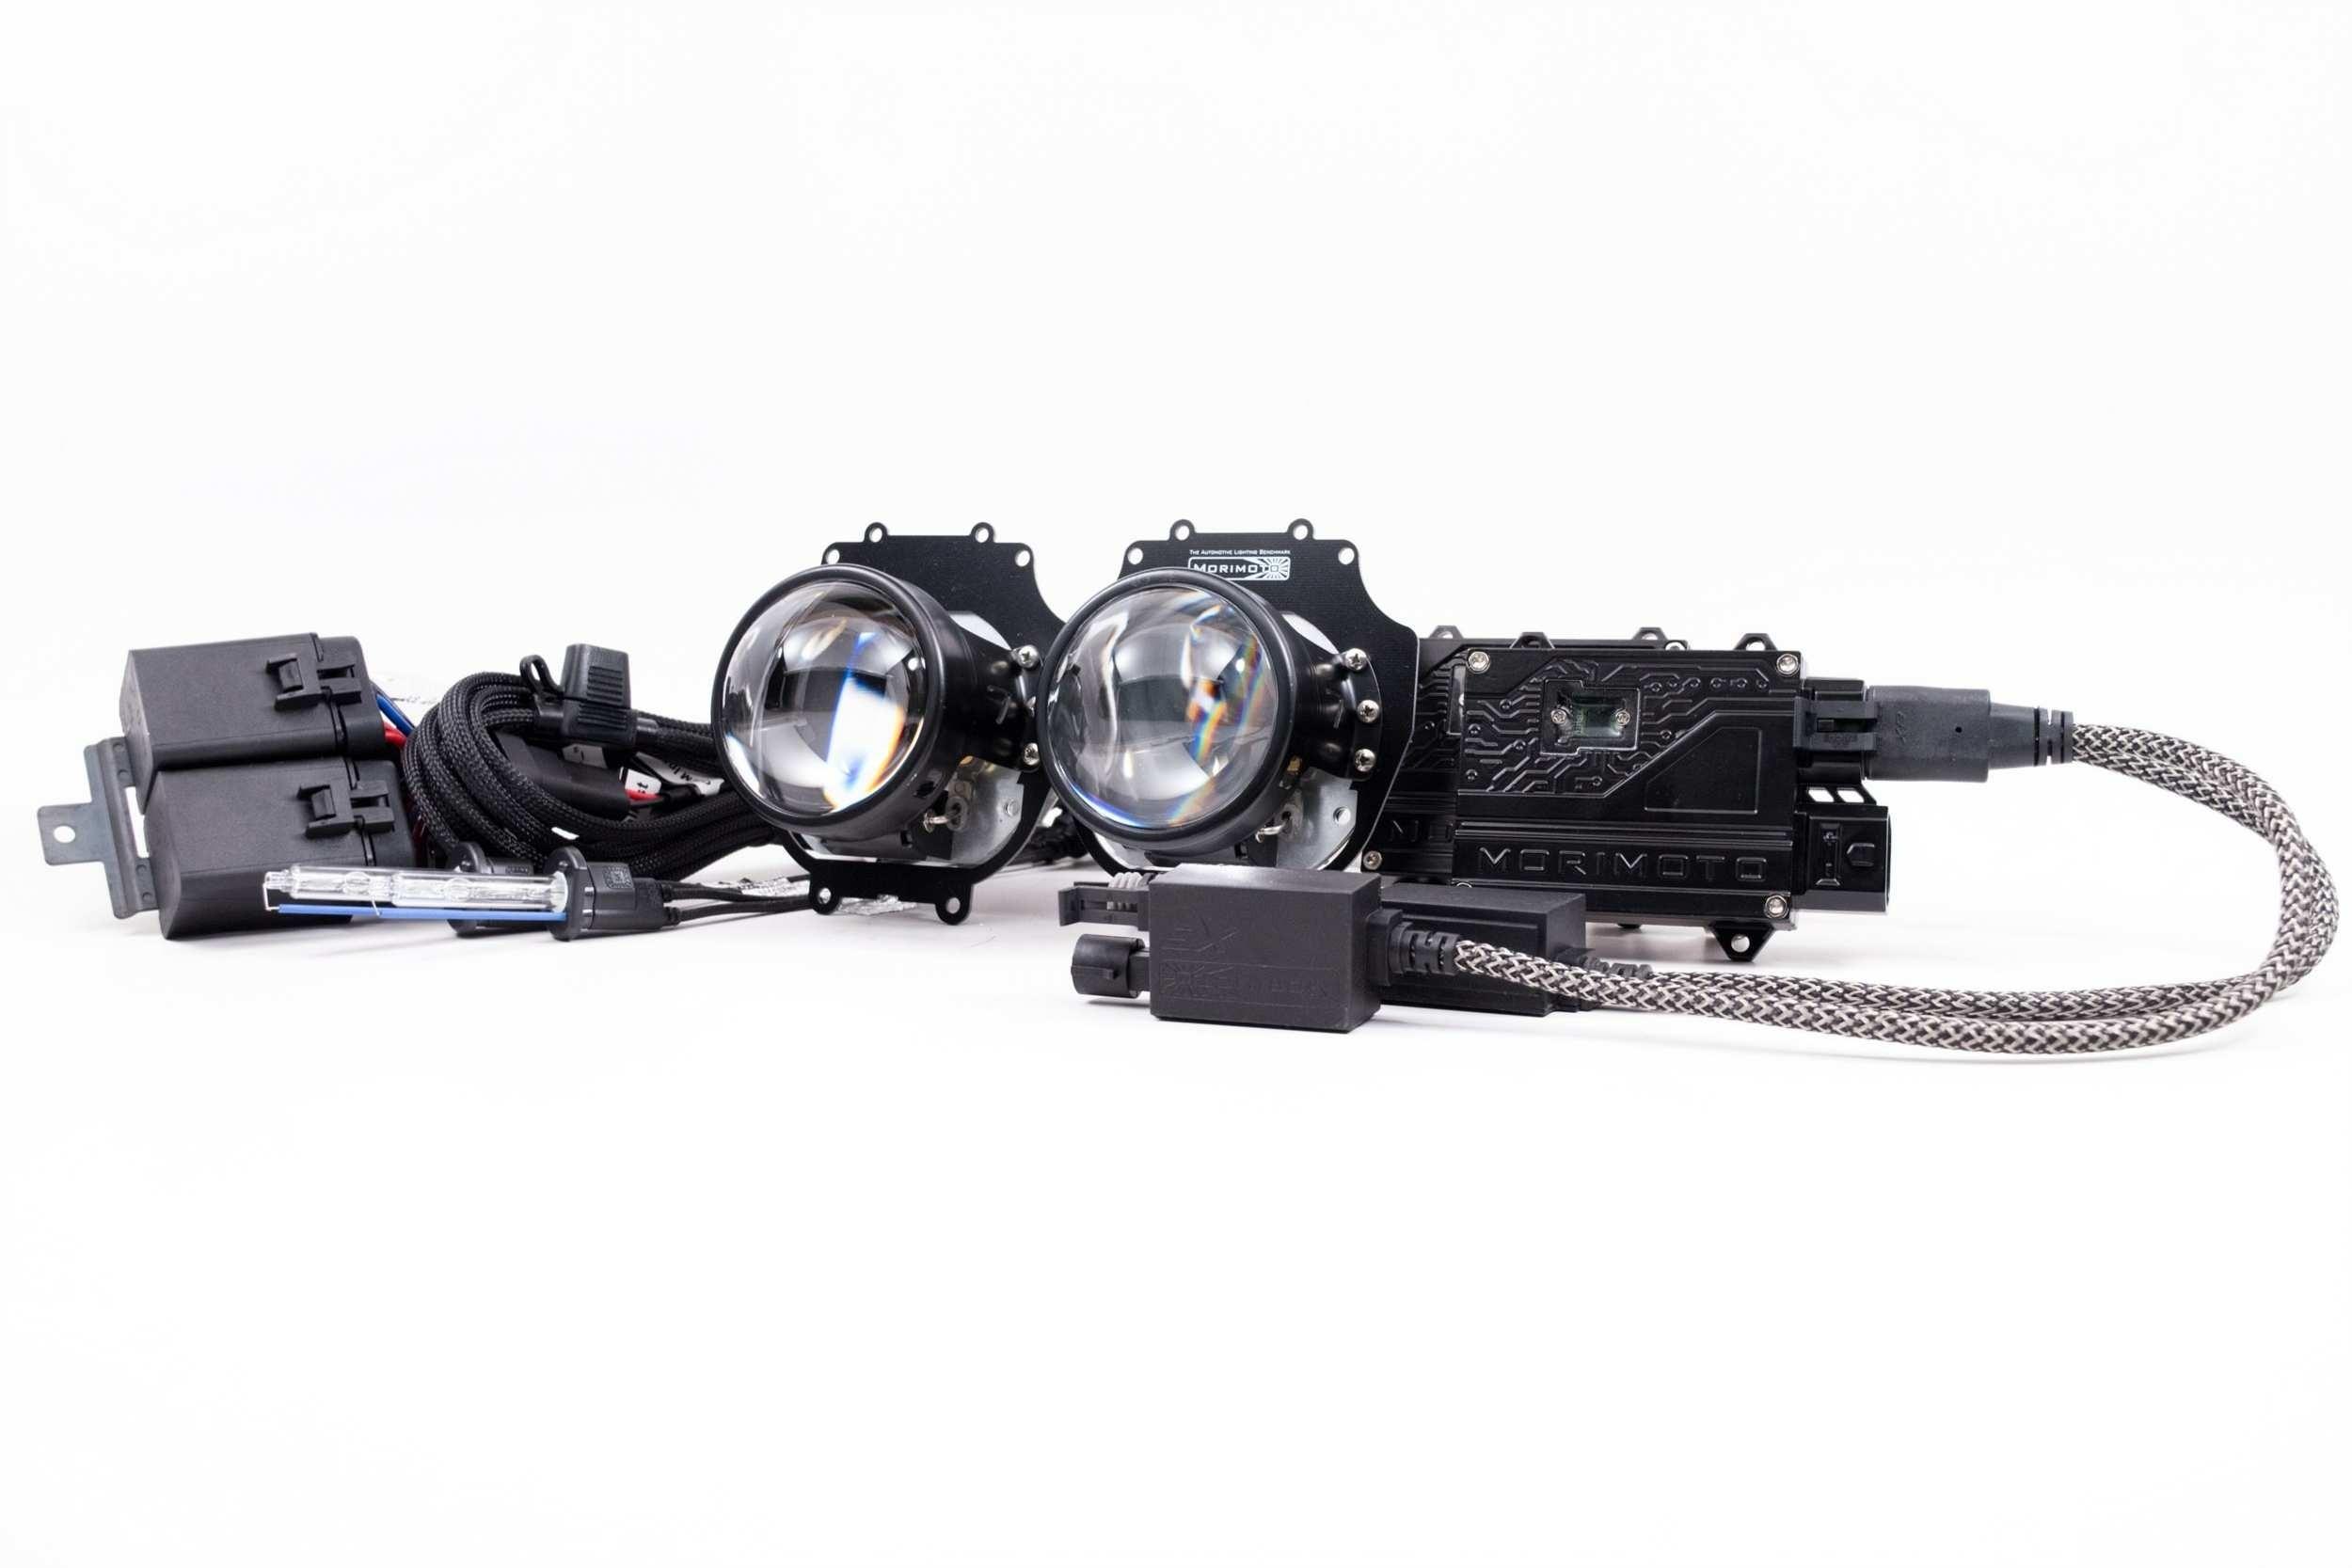 morimoto_retroquik_bi-xenon_headlight_upgrade_kit_07-09_toyota_camry